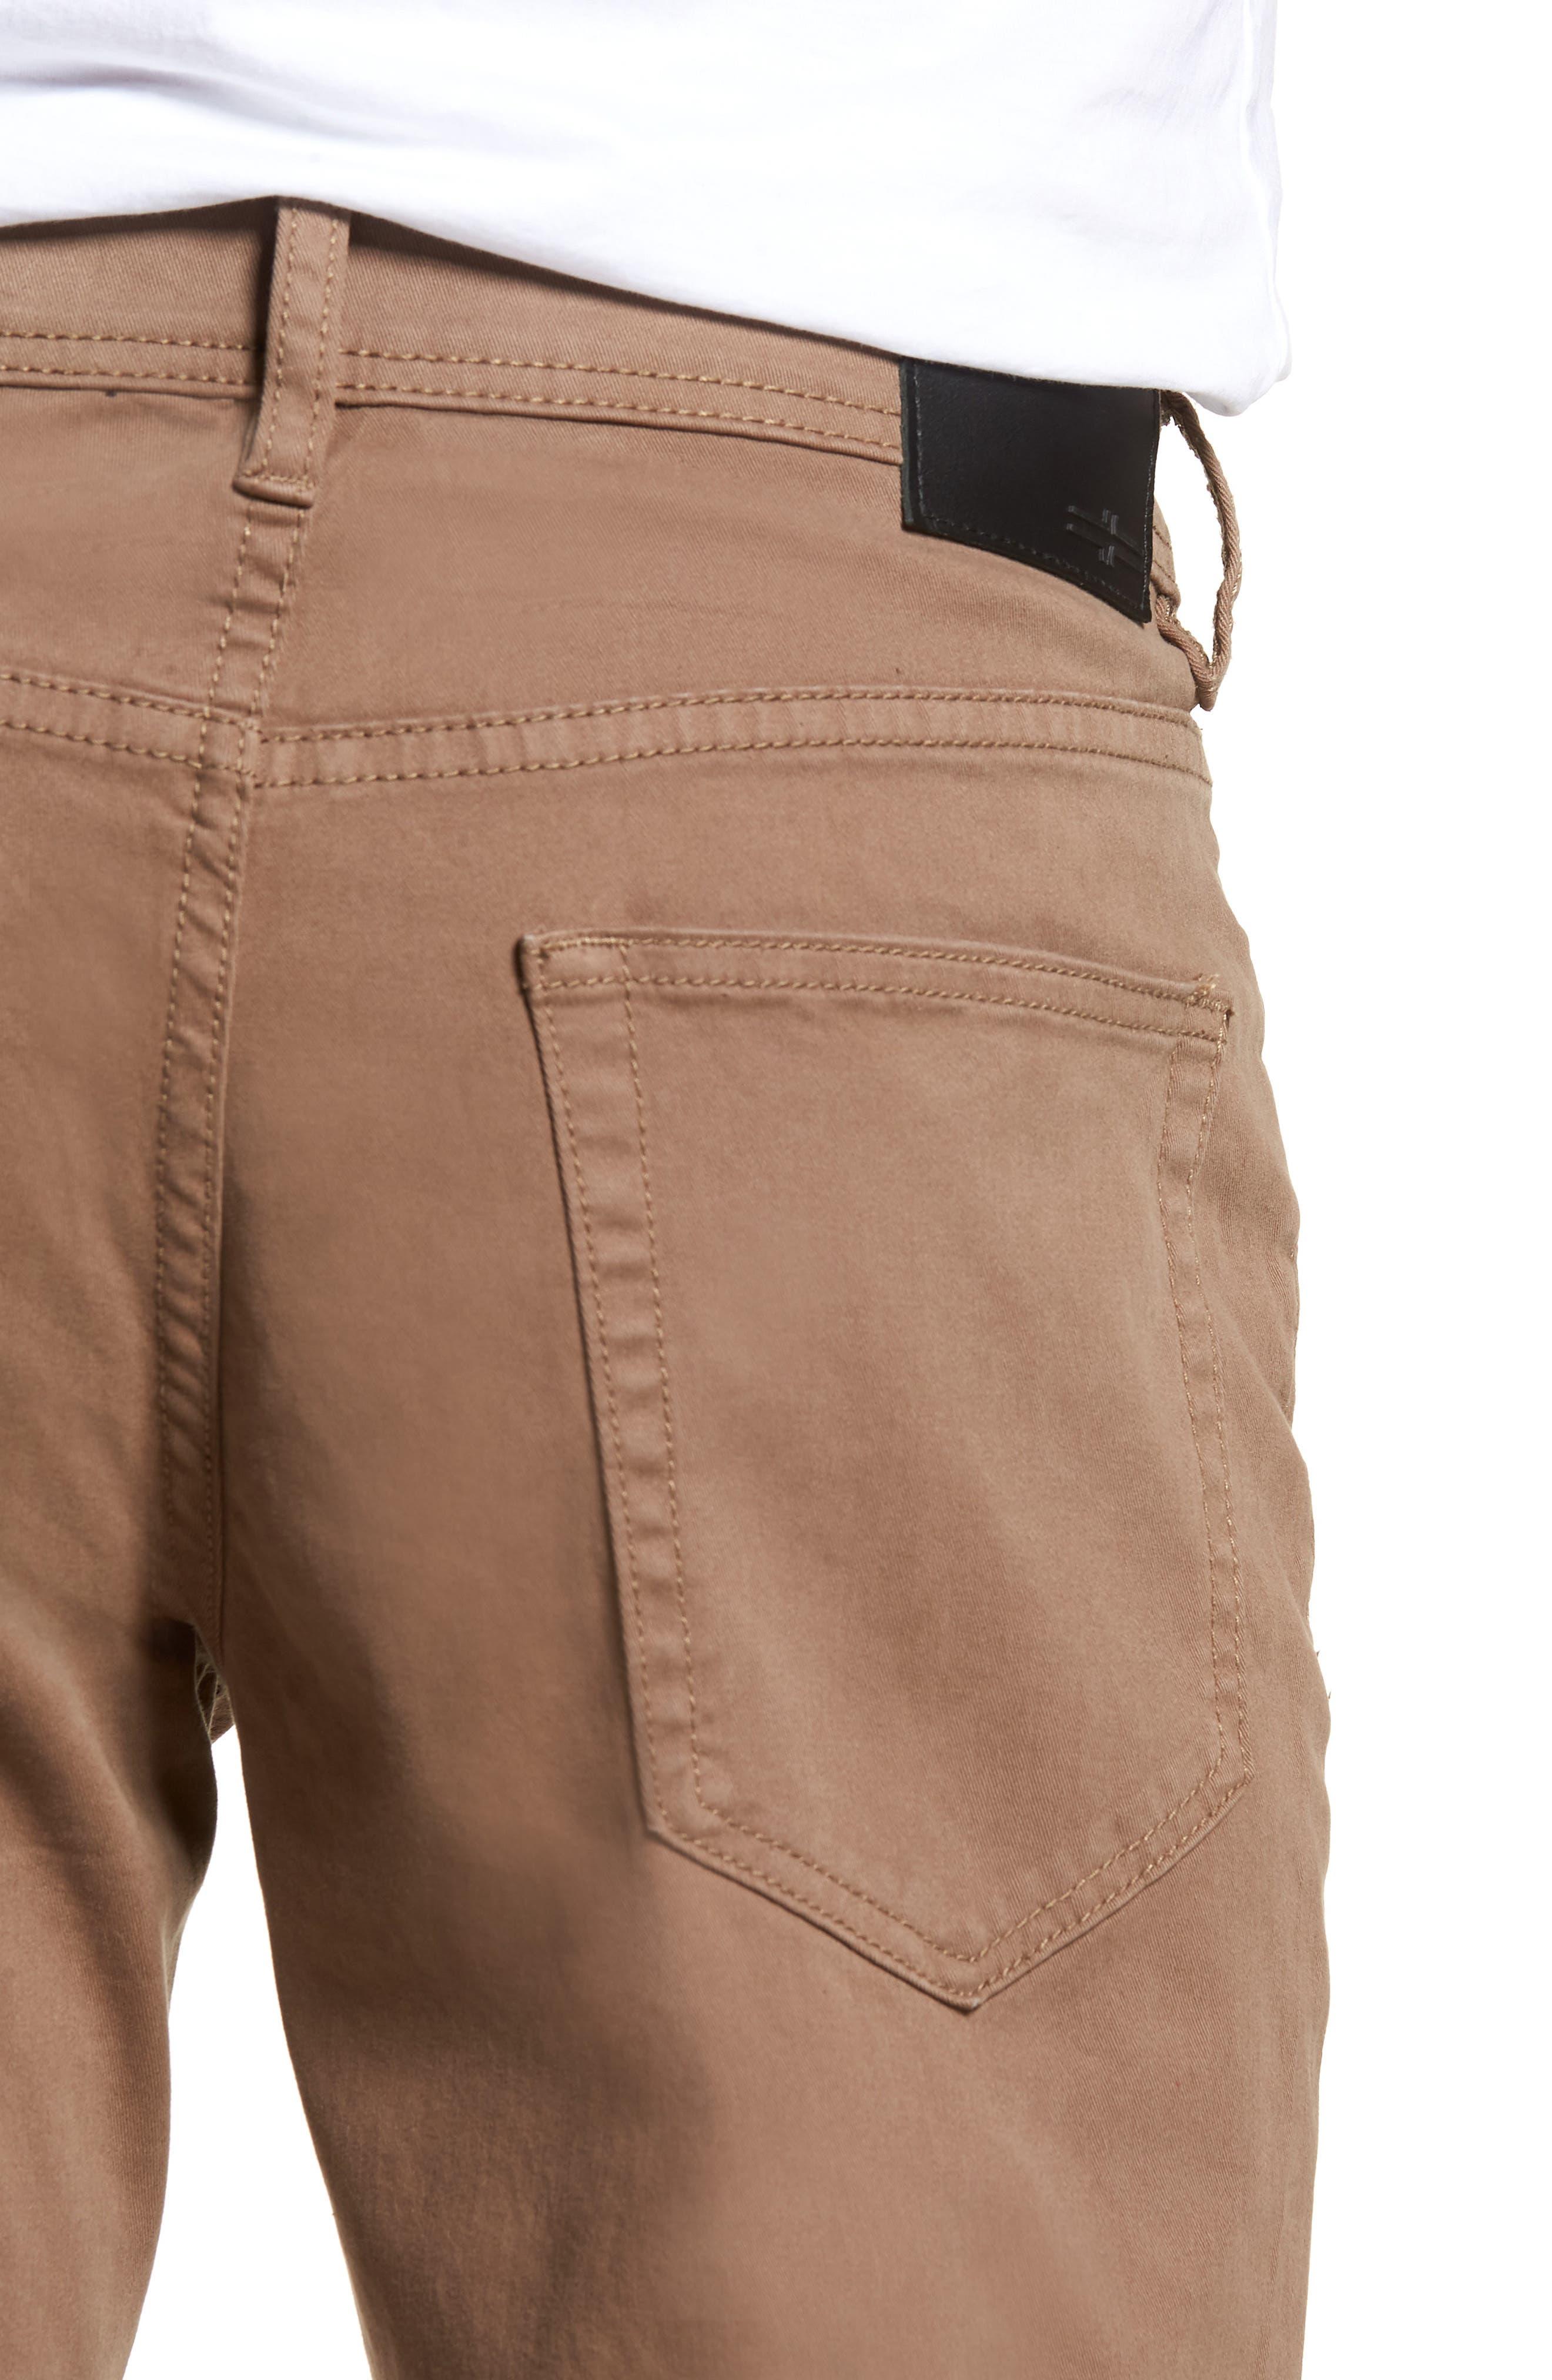 Jeans Co. Slim Straight Leg Jeans,                             Alternate thumbnail 4, color,                             Cub